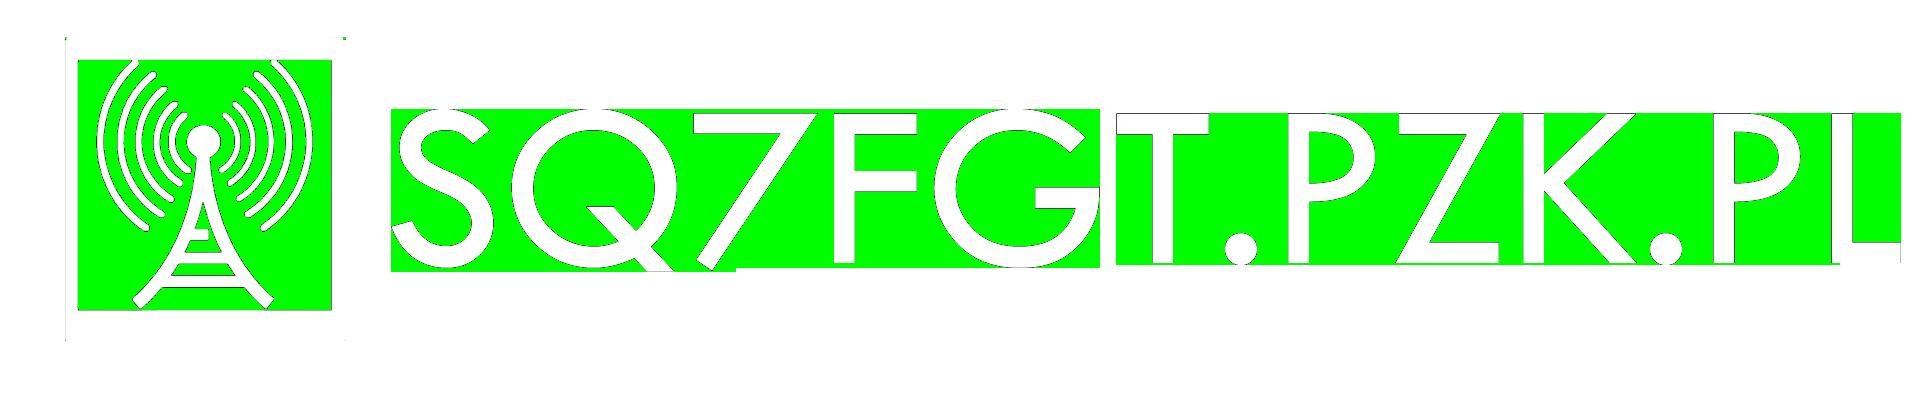 SQ7FGT.PZK.PL